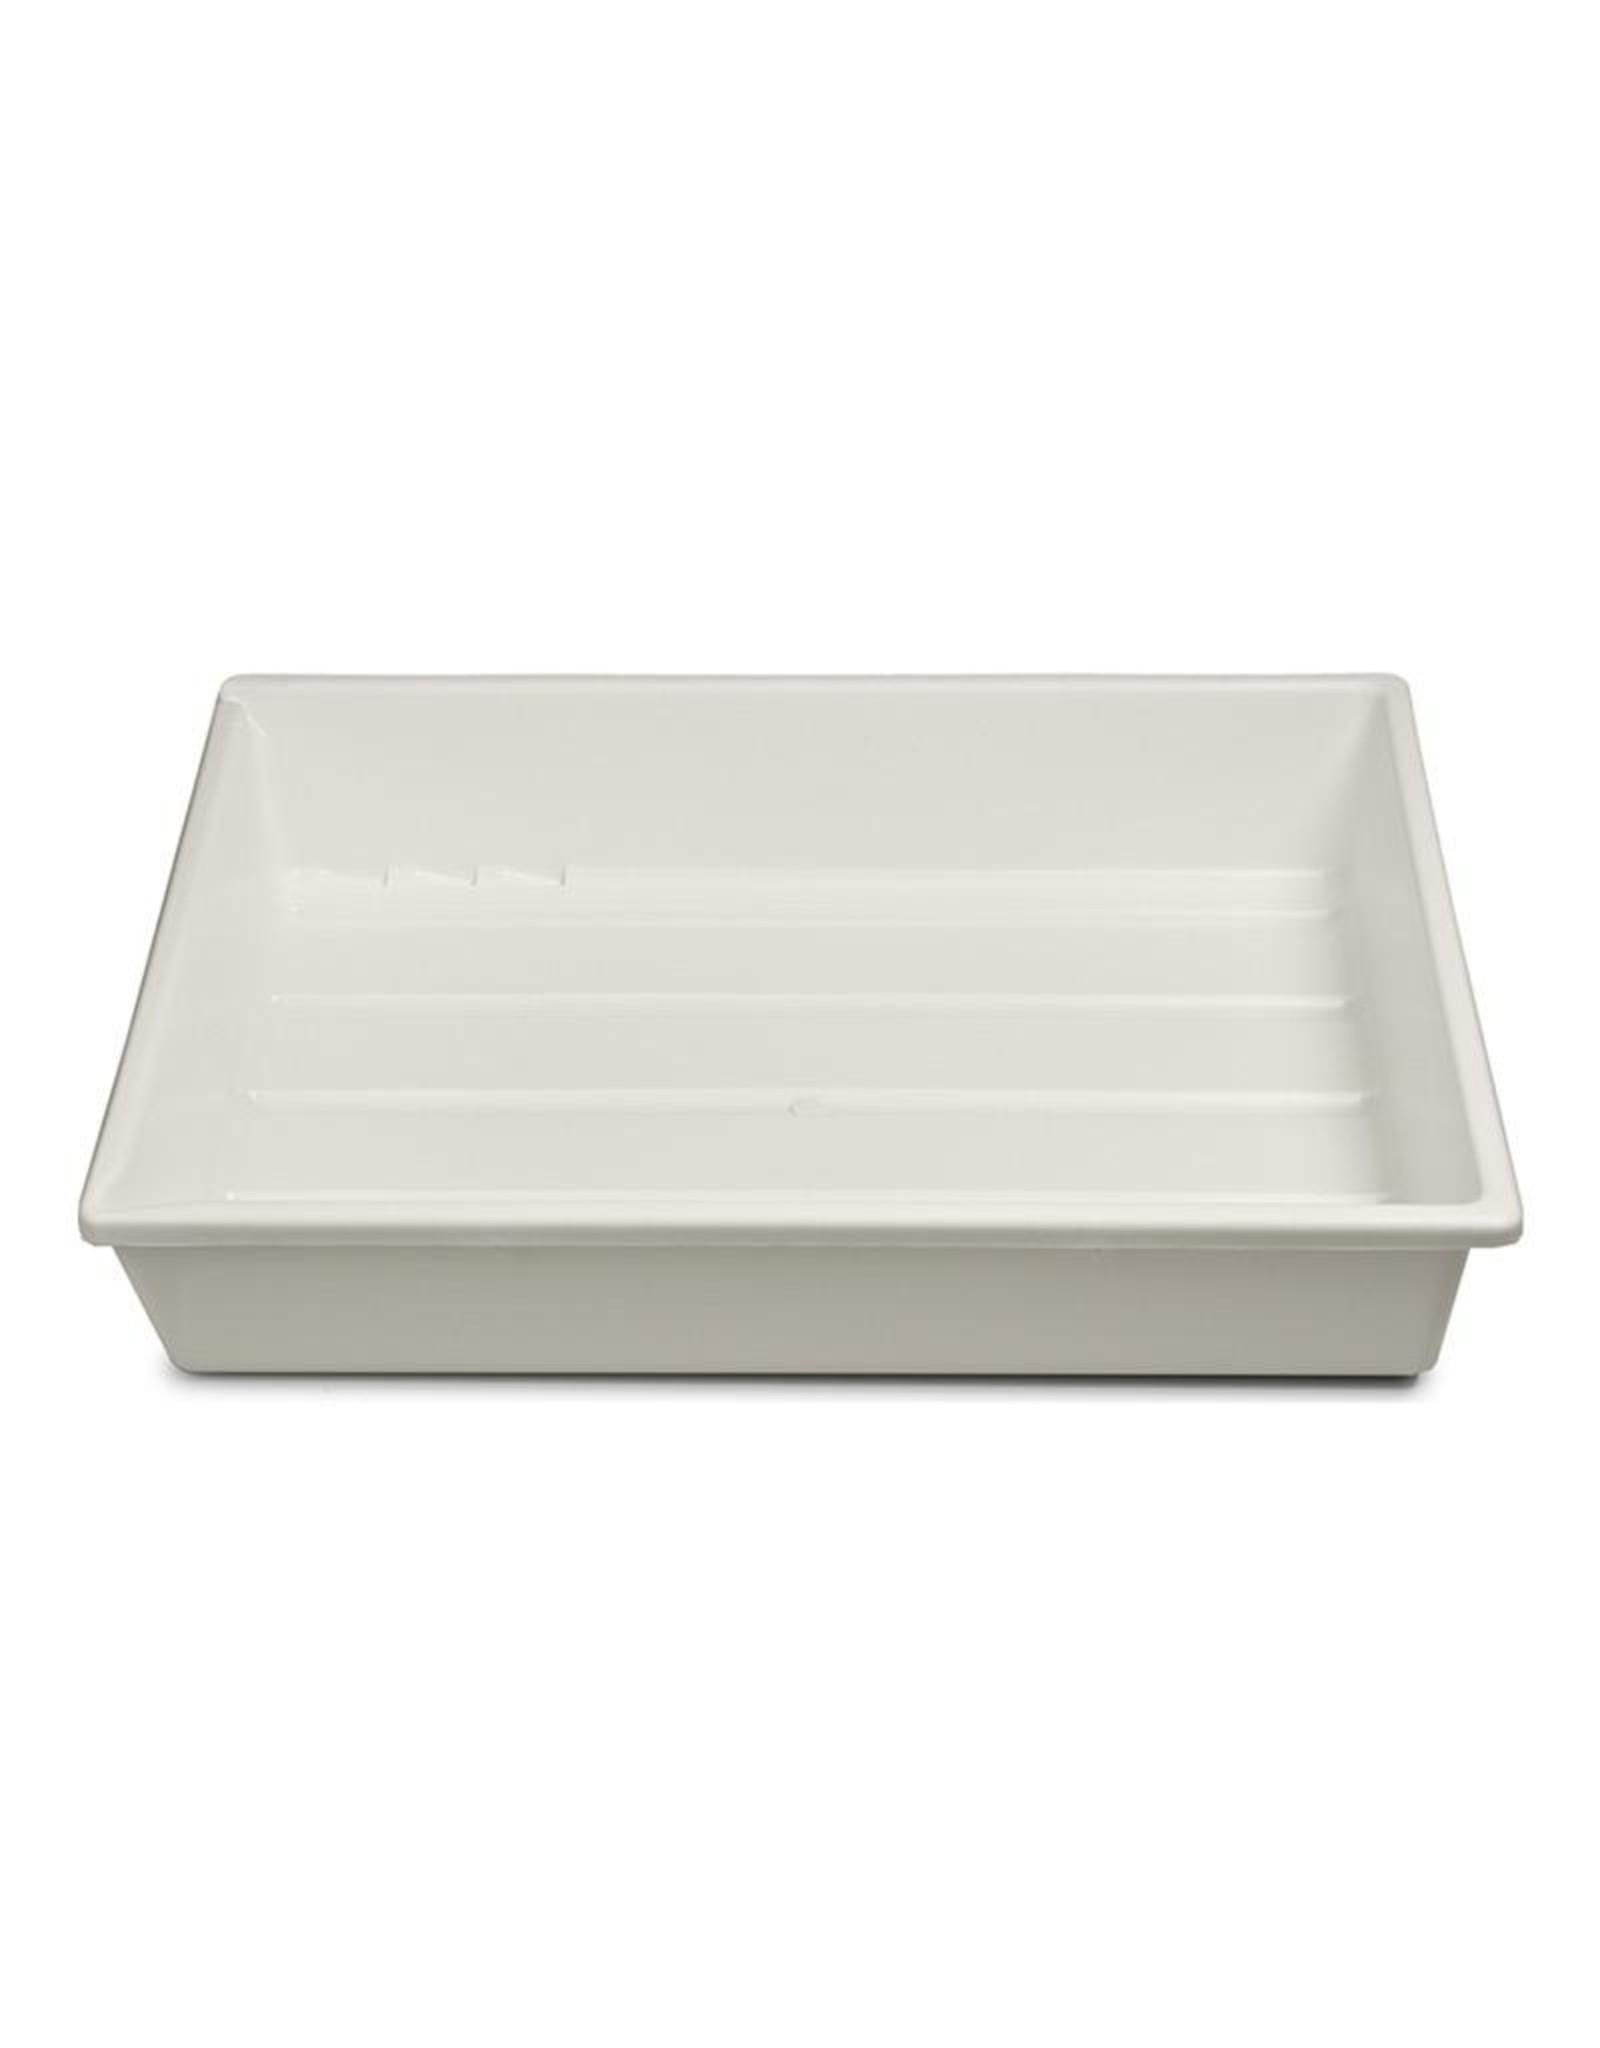 "Kaiser Kaiser Lab Tray, 30 x 40 cm (11.8 x 15.7""), white"